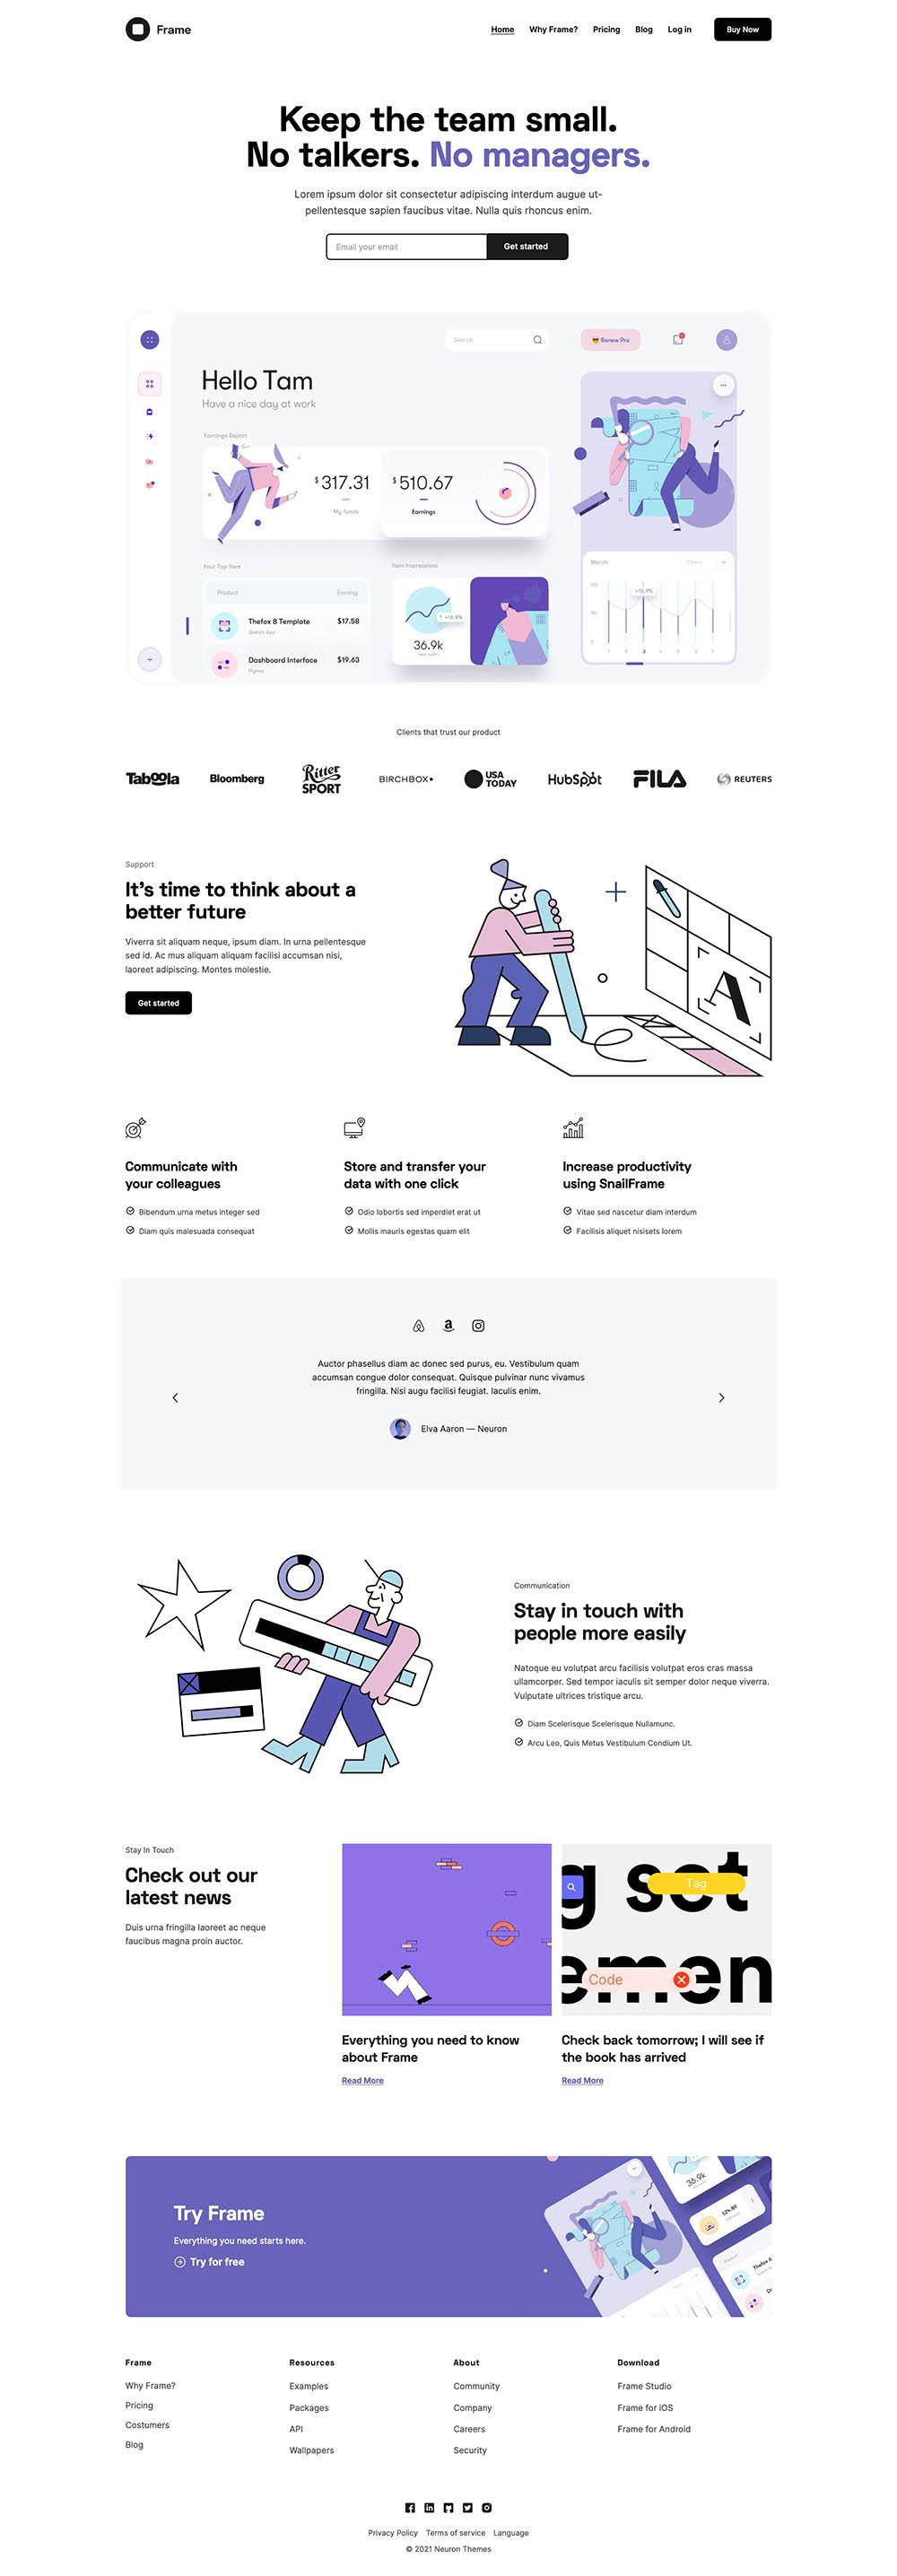 Frame Software as Services Demo Website for WordPress